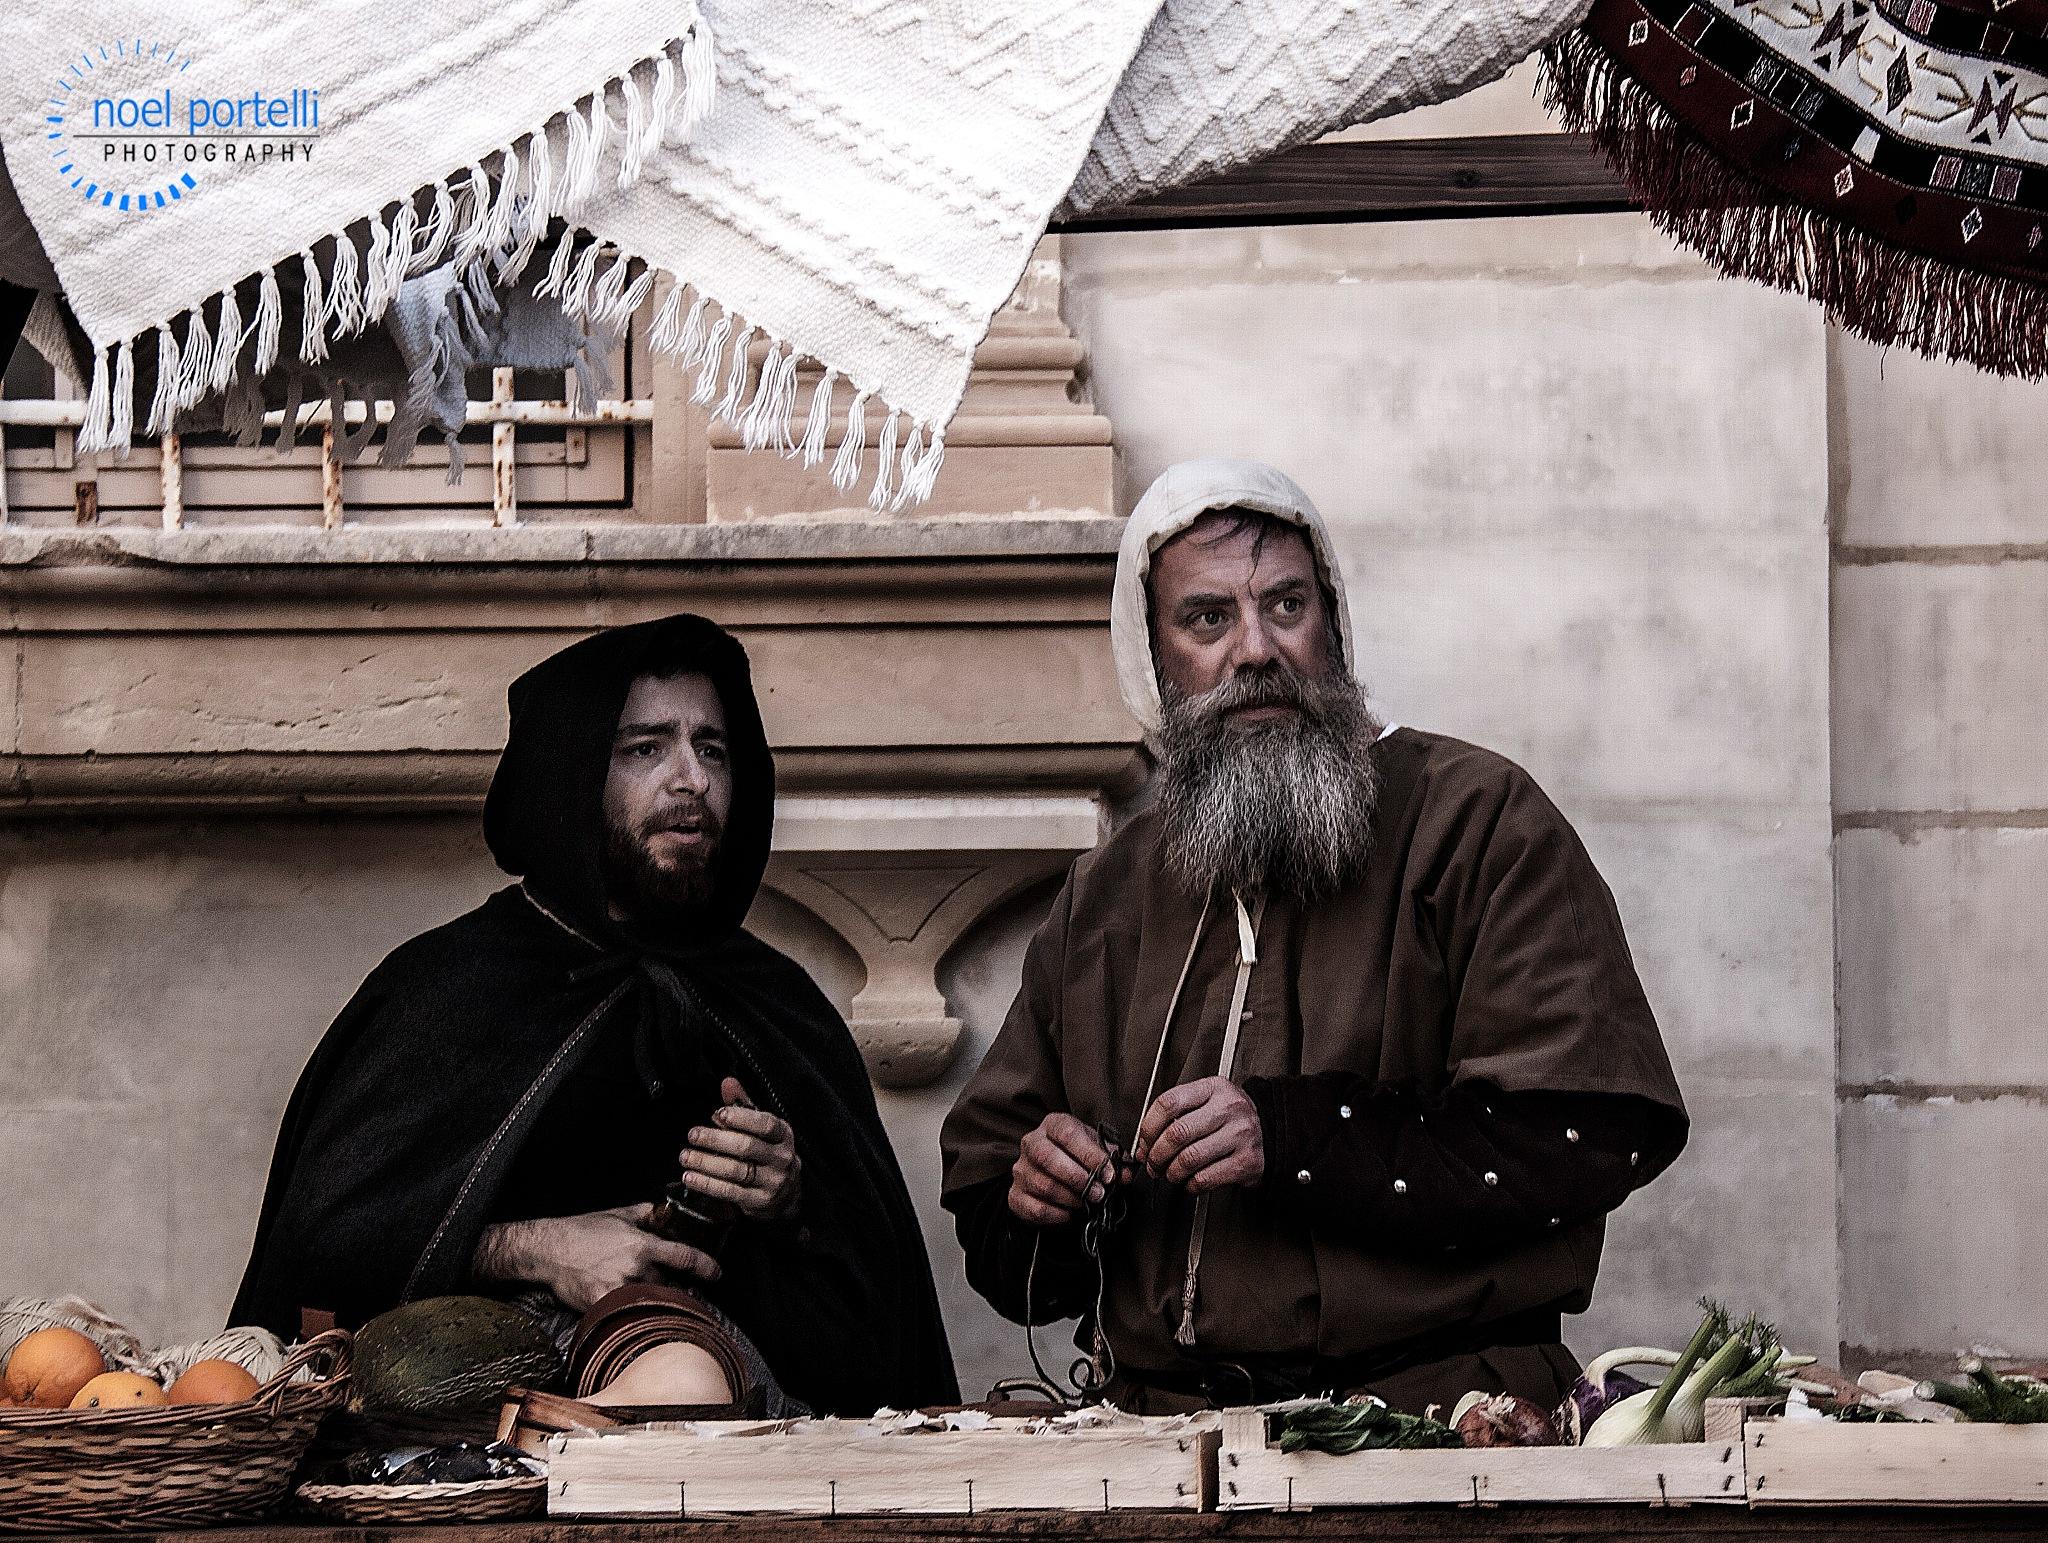 Medieval Mdina 2017 by Noel Portelli